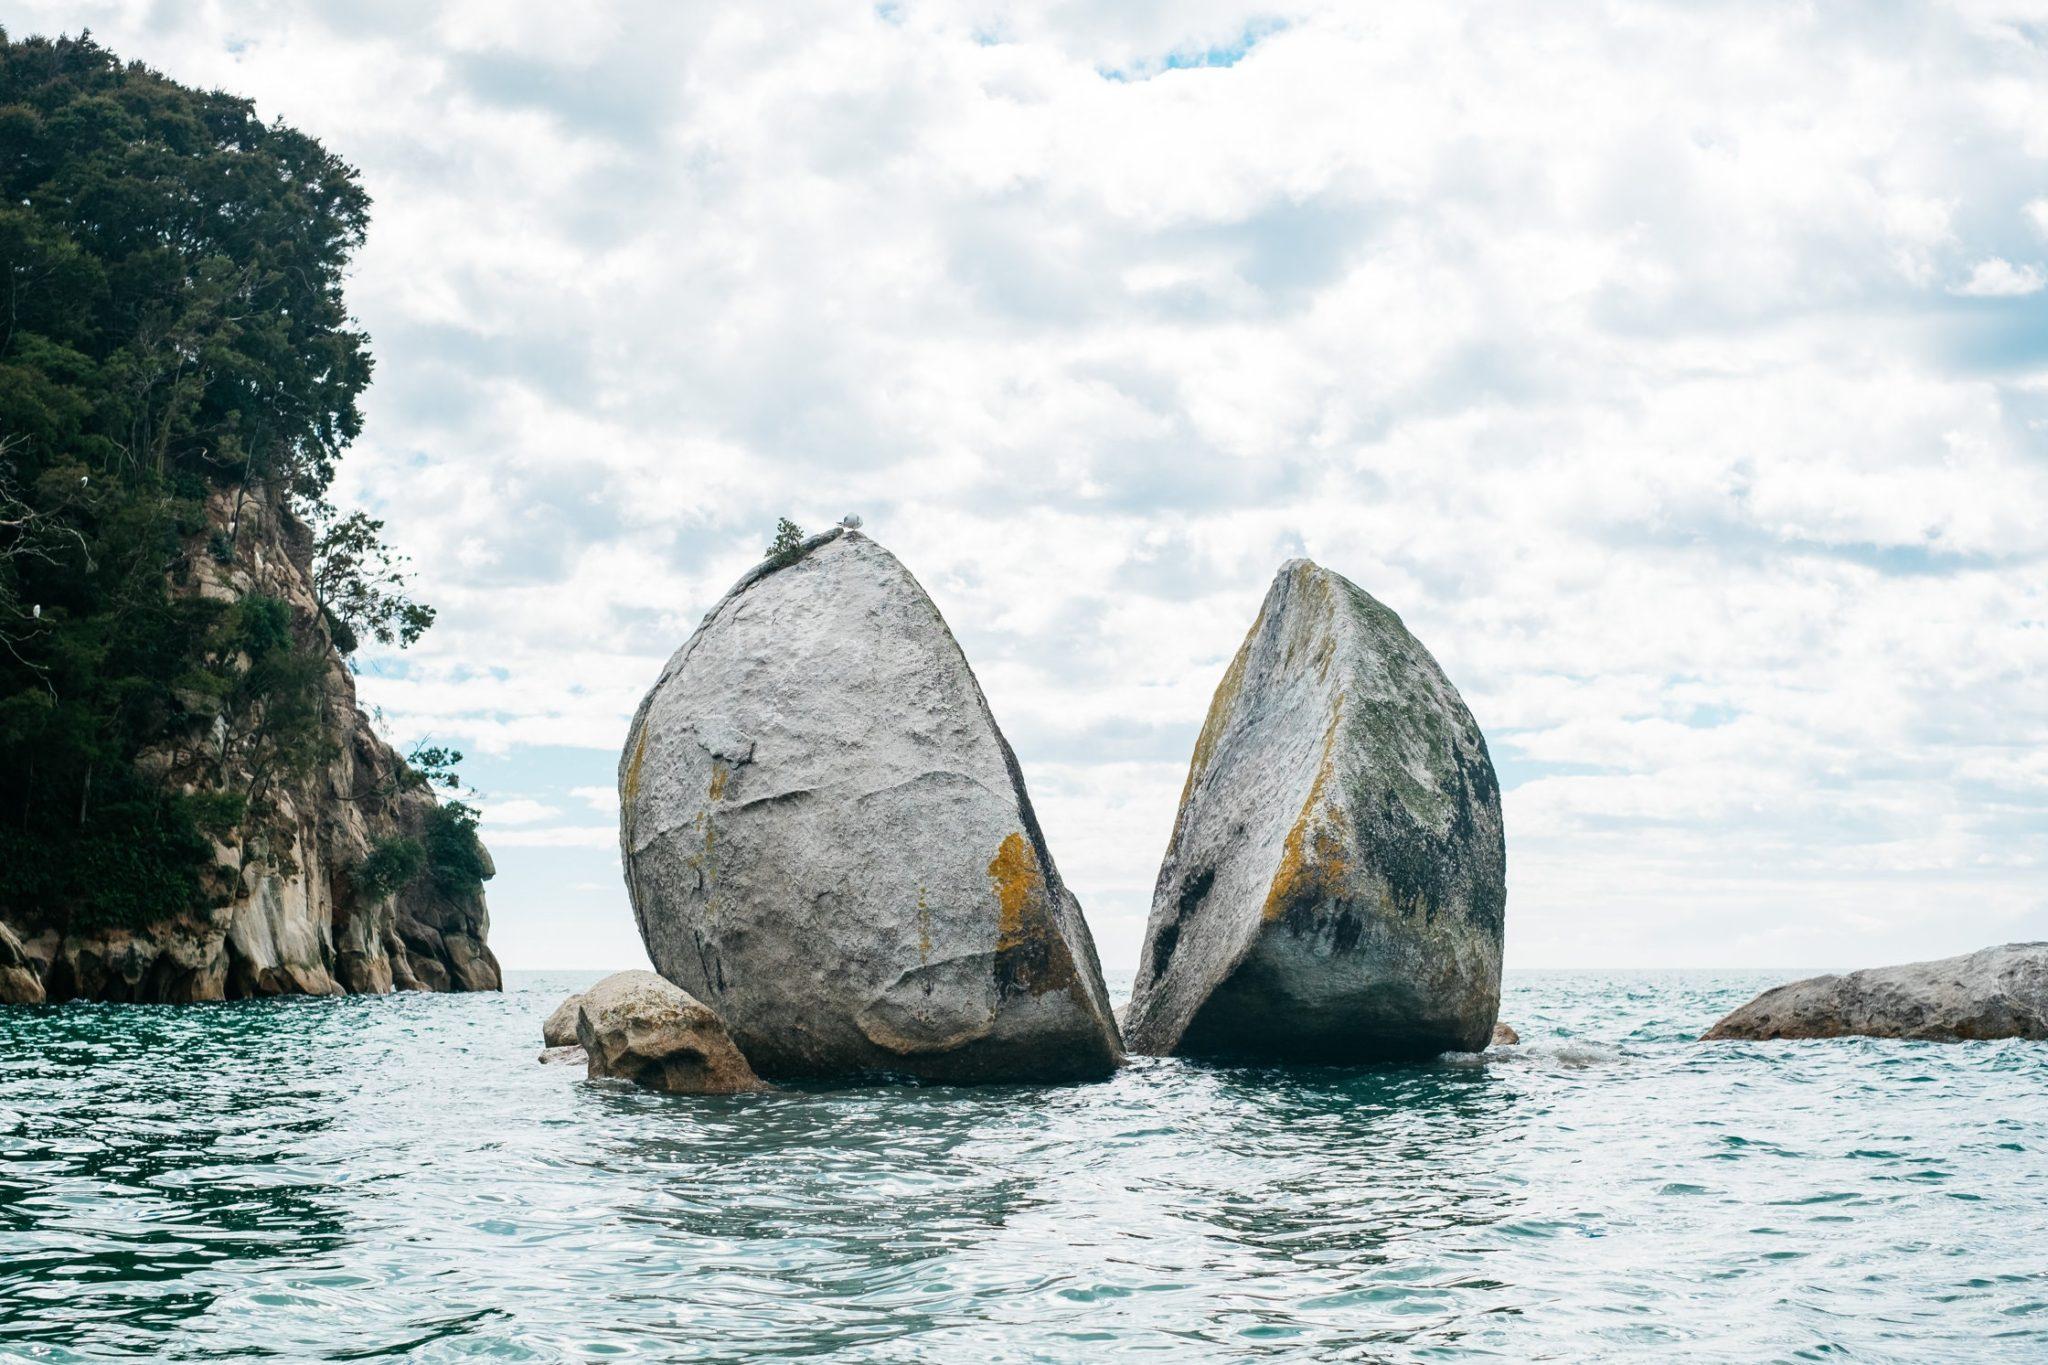 Split Apple Rock, Kaiteriteri, New Zealand. Photo by Pablo Heimplatz on Unsplash